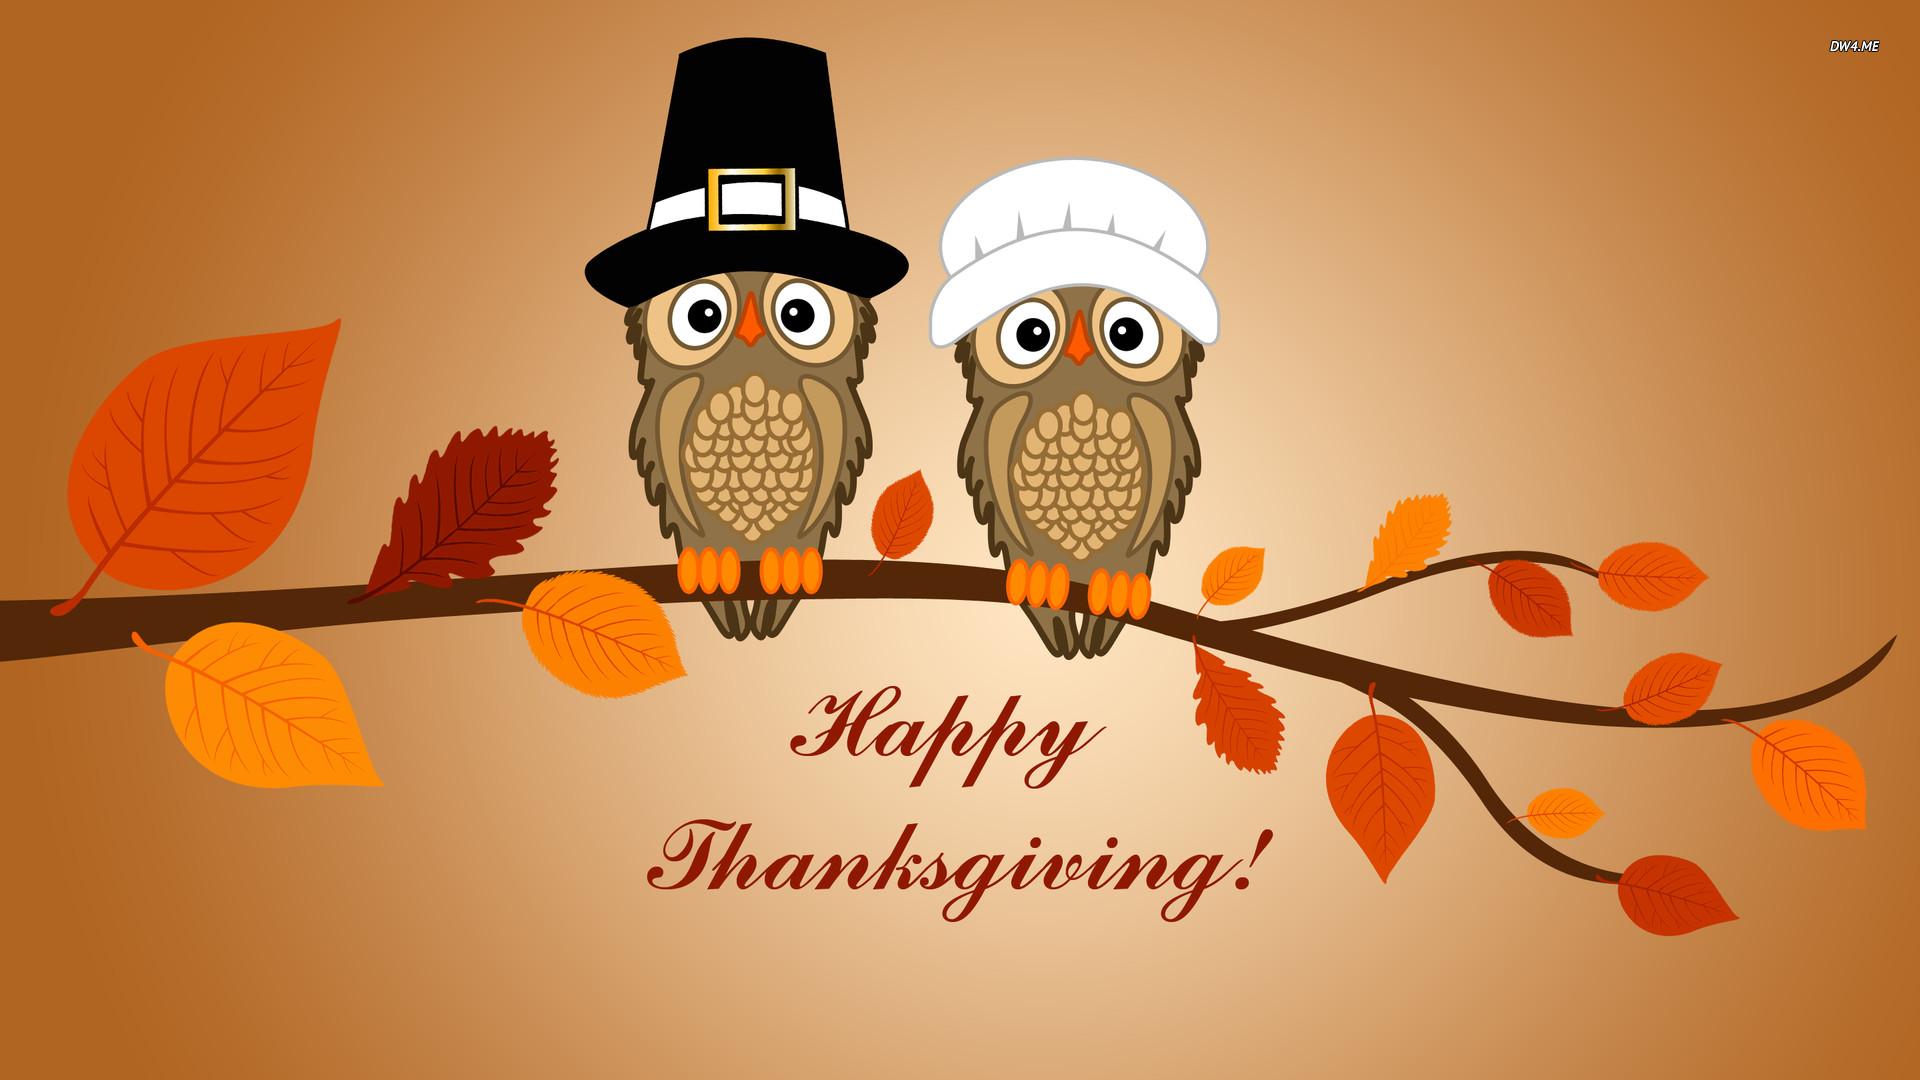 Happy Thanksgiving Wallpaper 2017